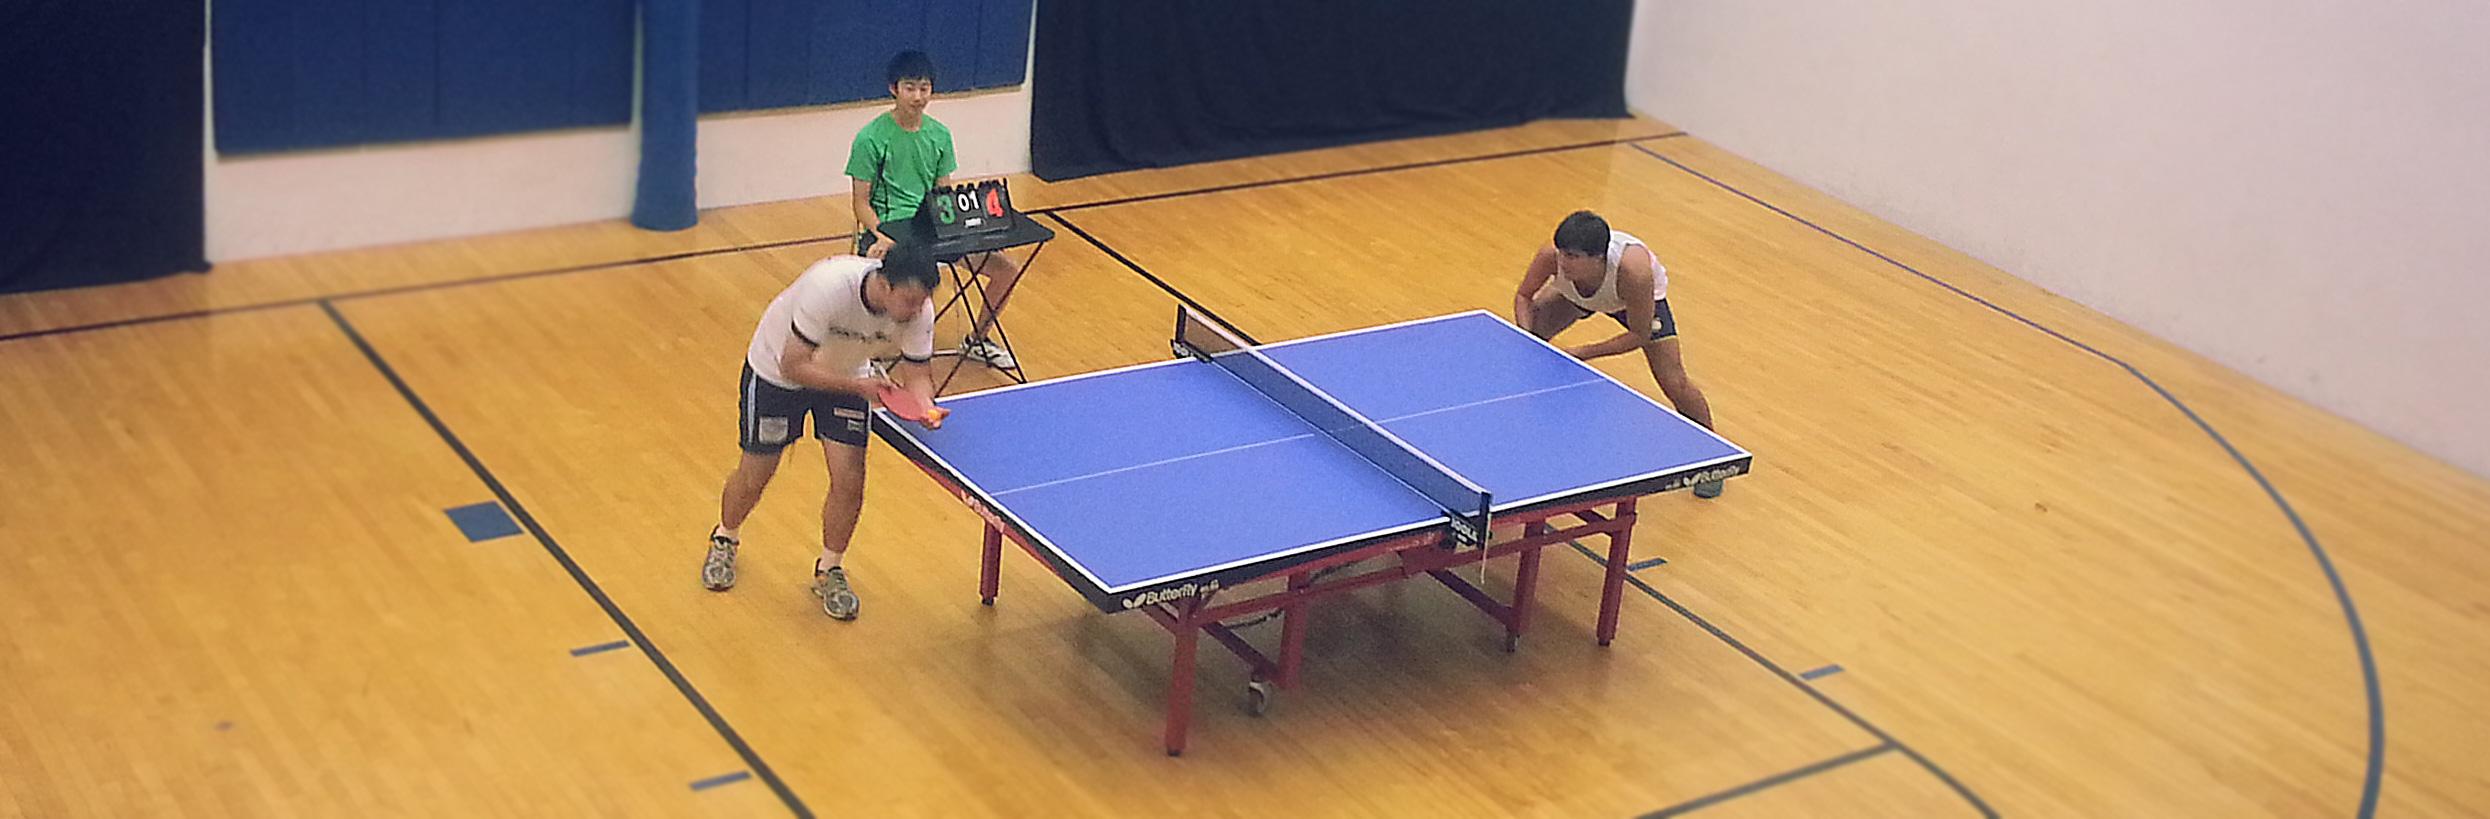 Equal-Challenge-Final-Match